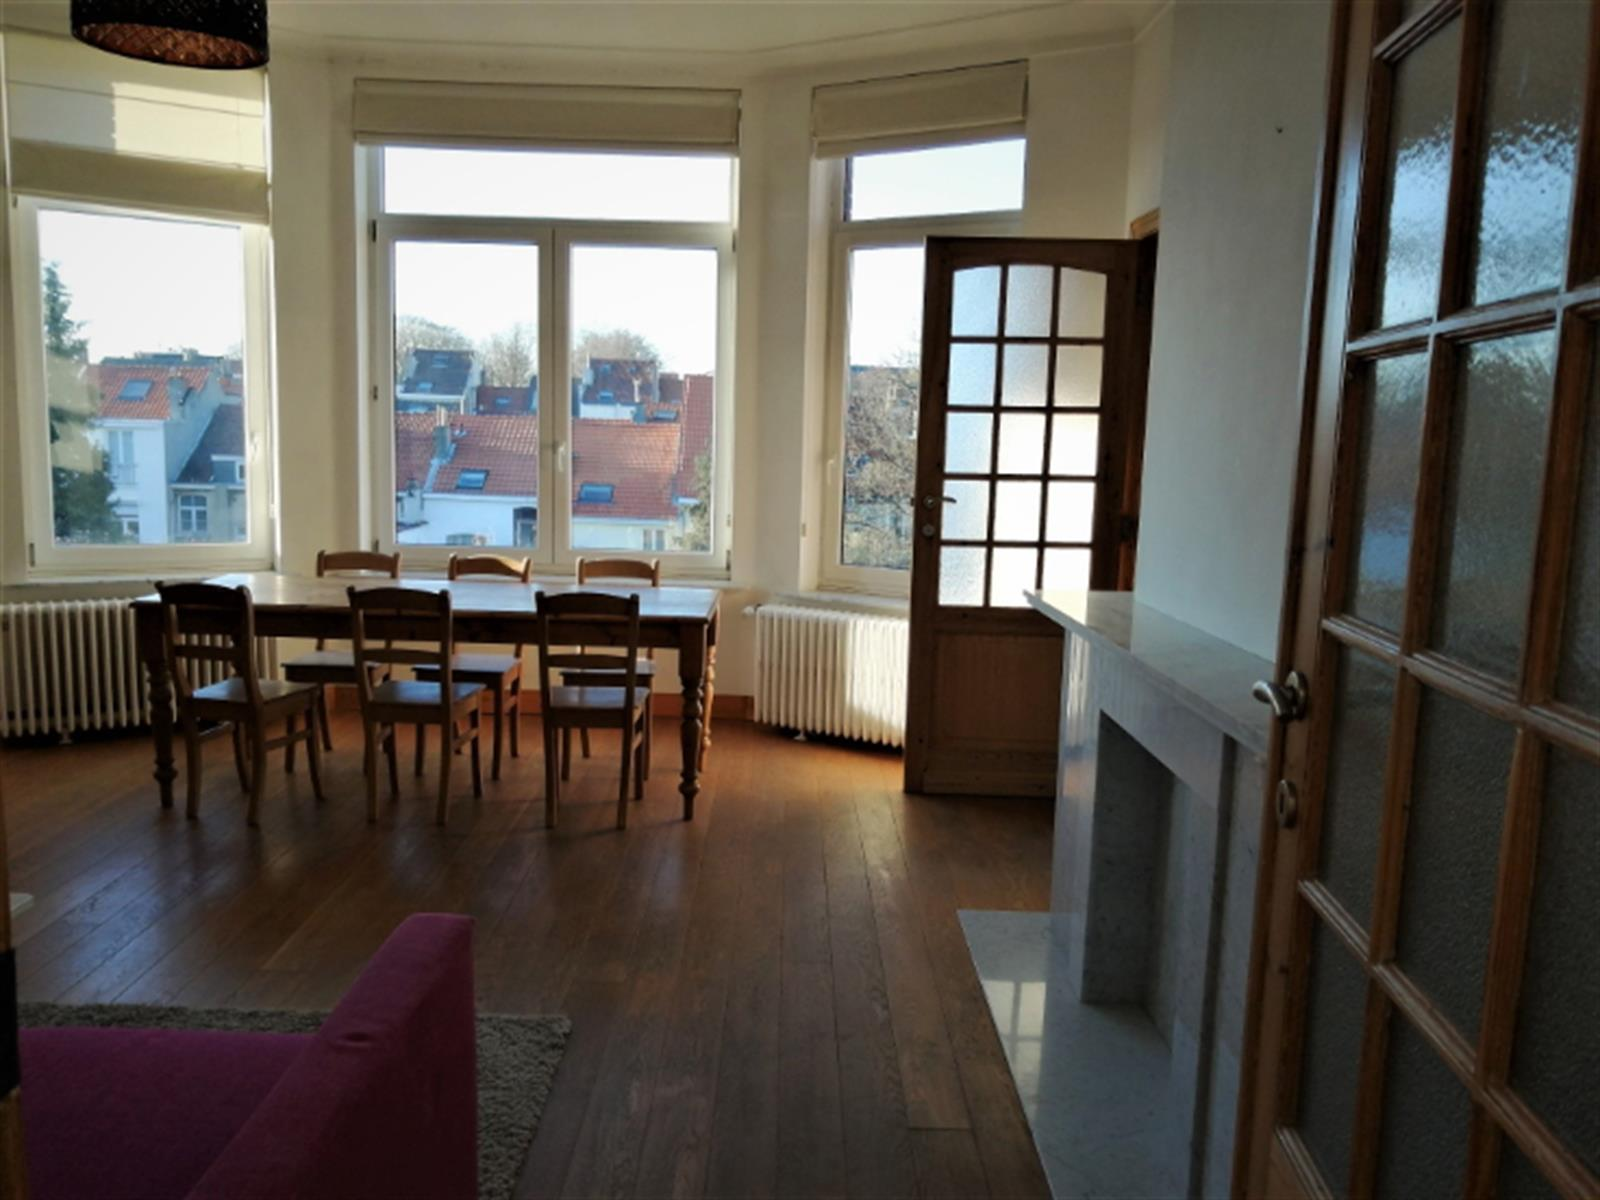 Appartement - Woluwe-Saint-Lambert - #4106440-1